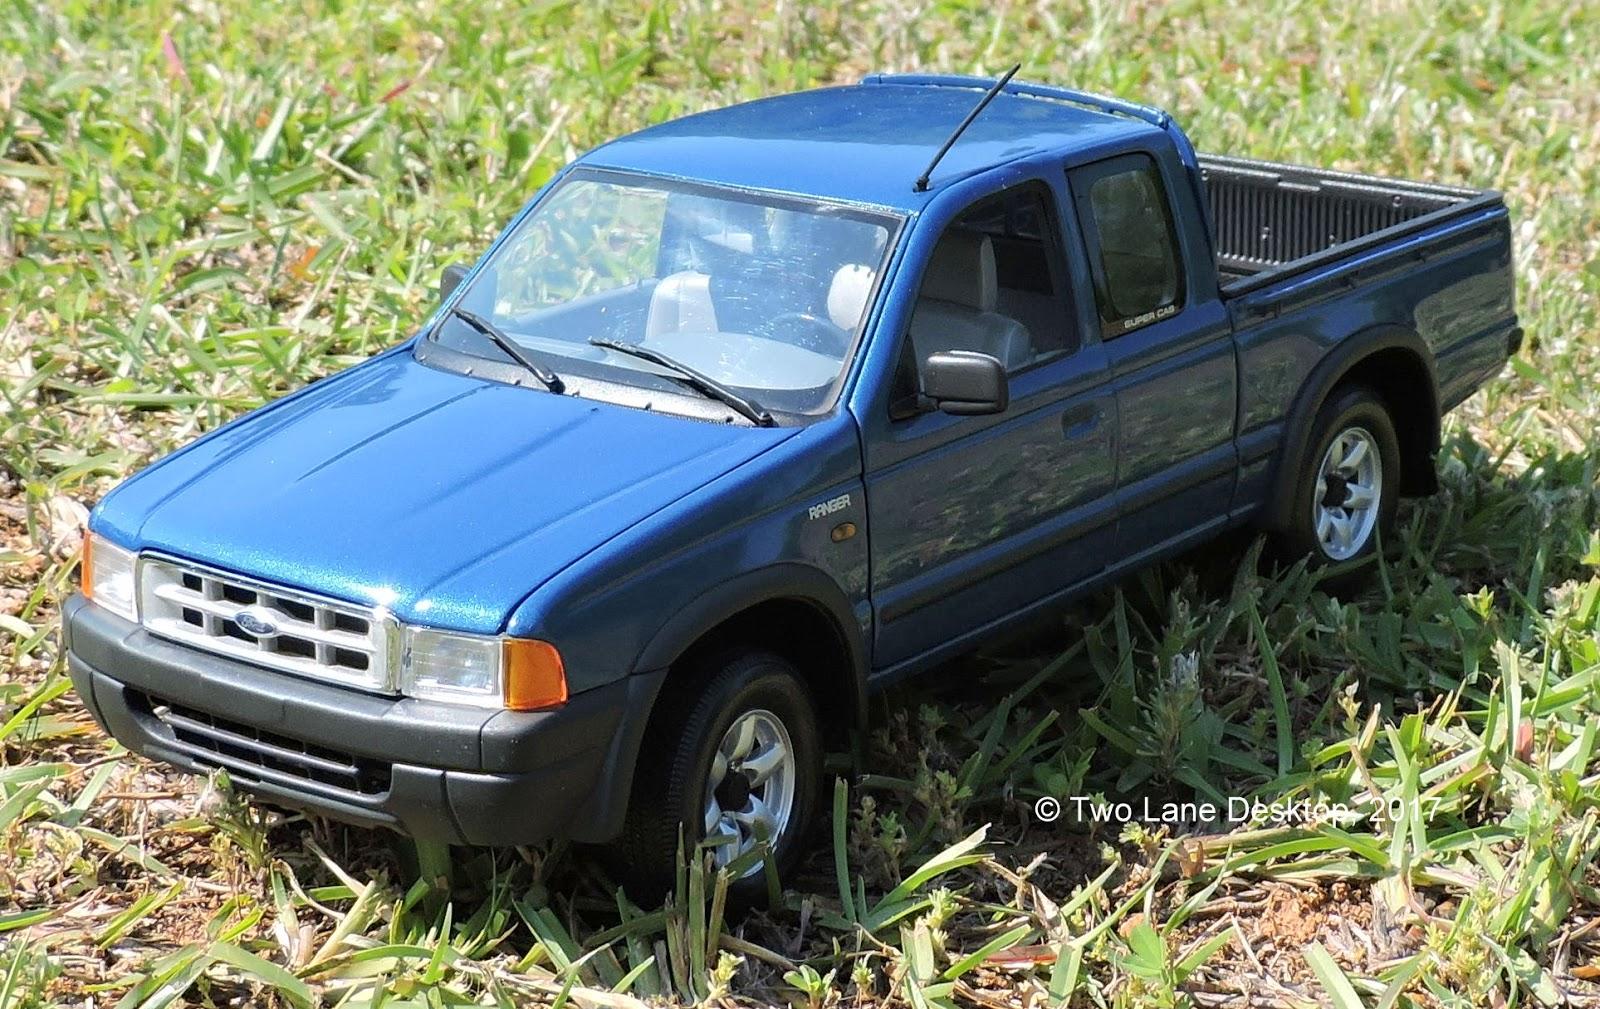 Two Lane Desktop: Action 1:18 2001 Ford Ranger Pickup